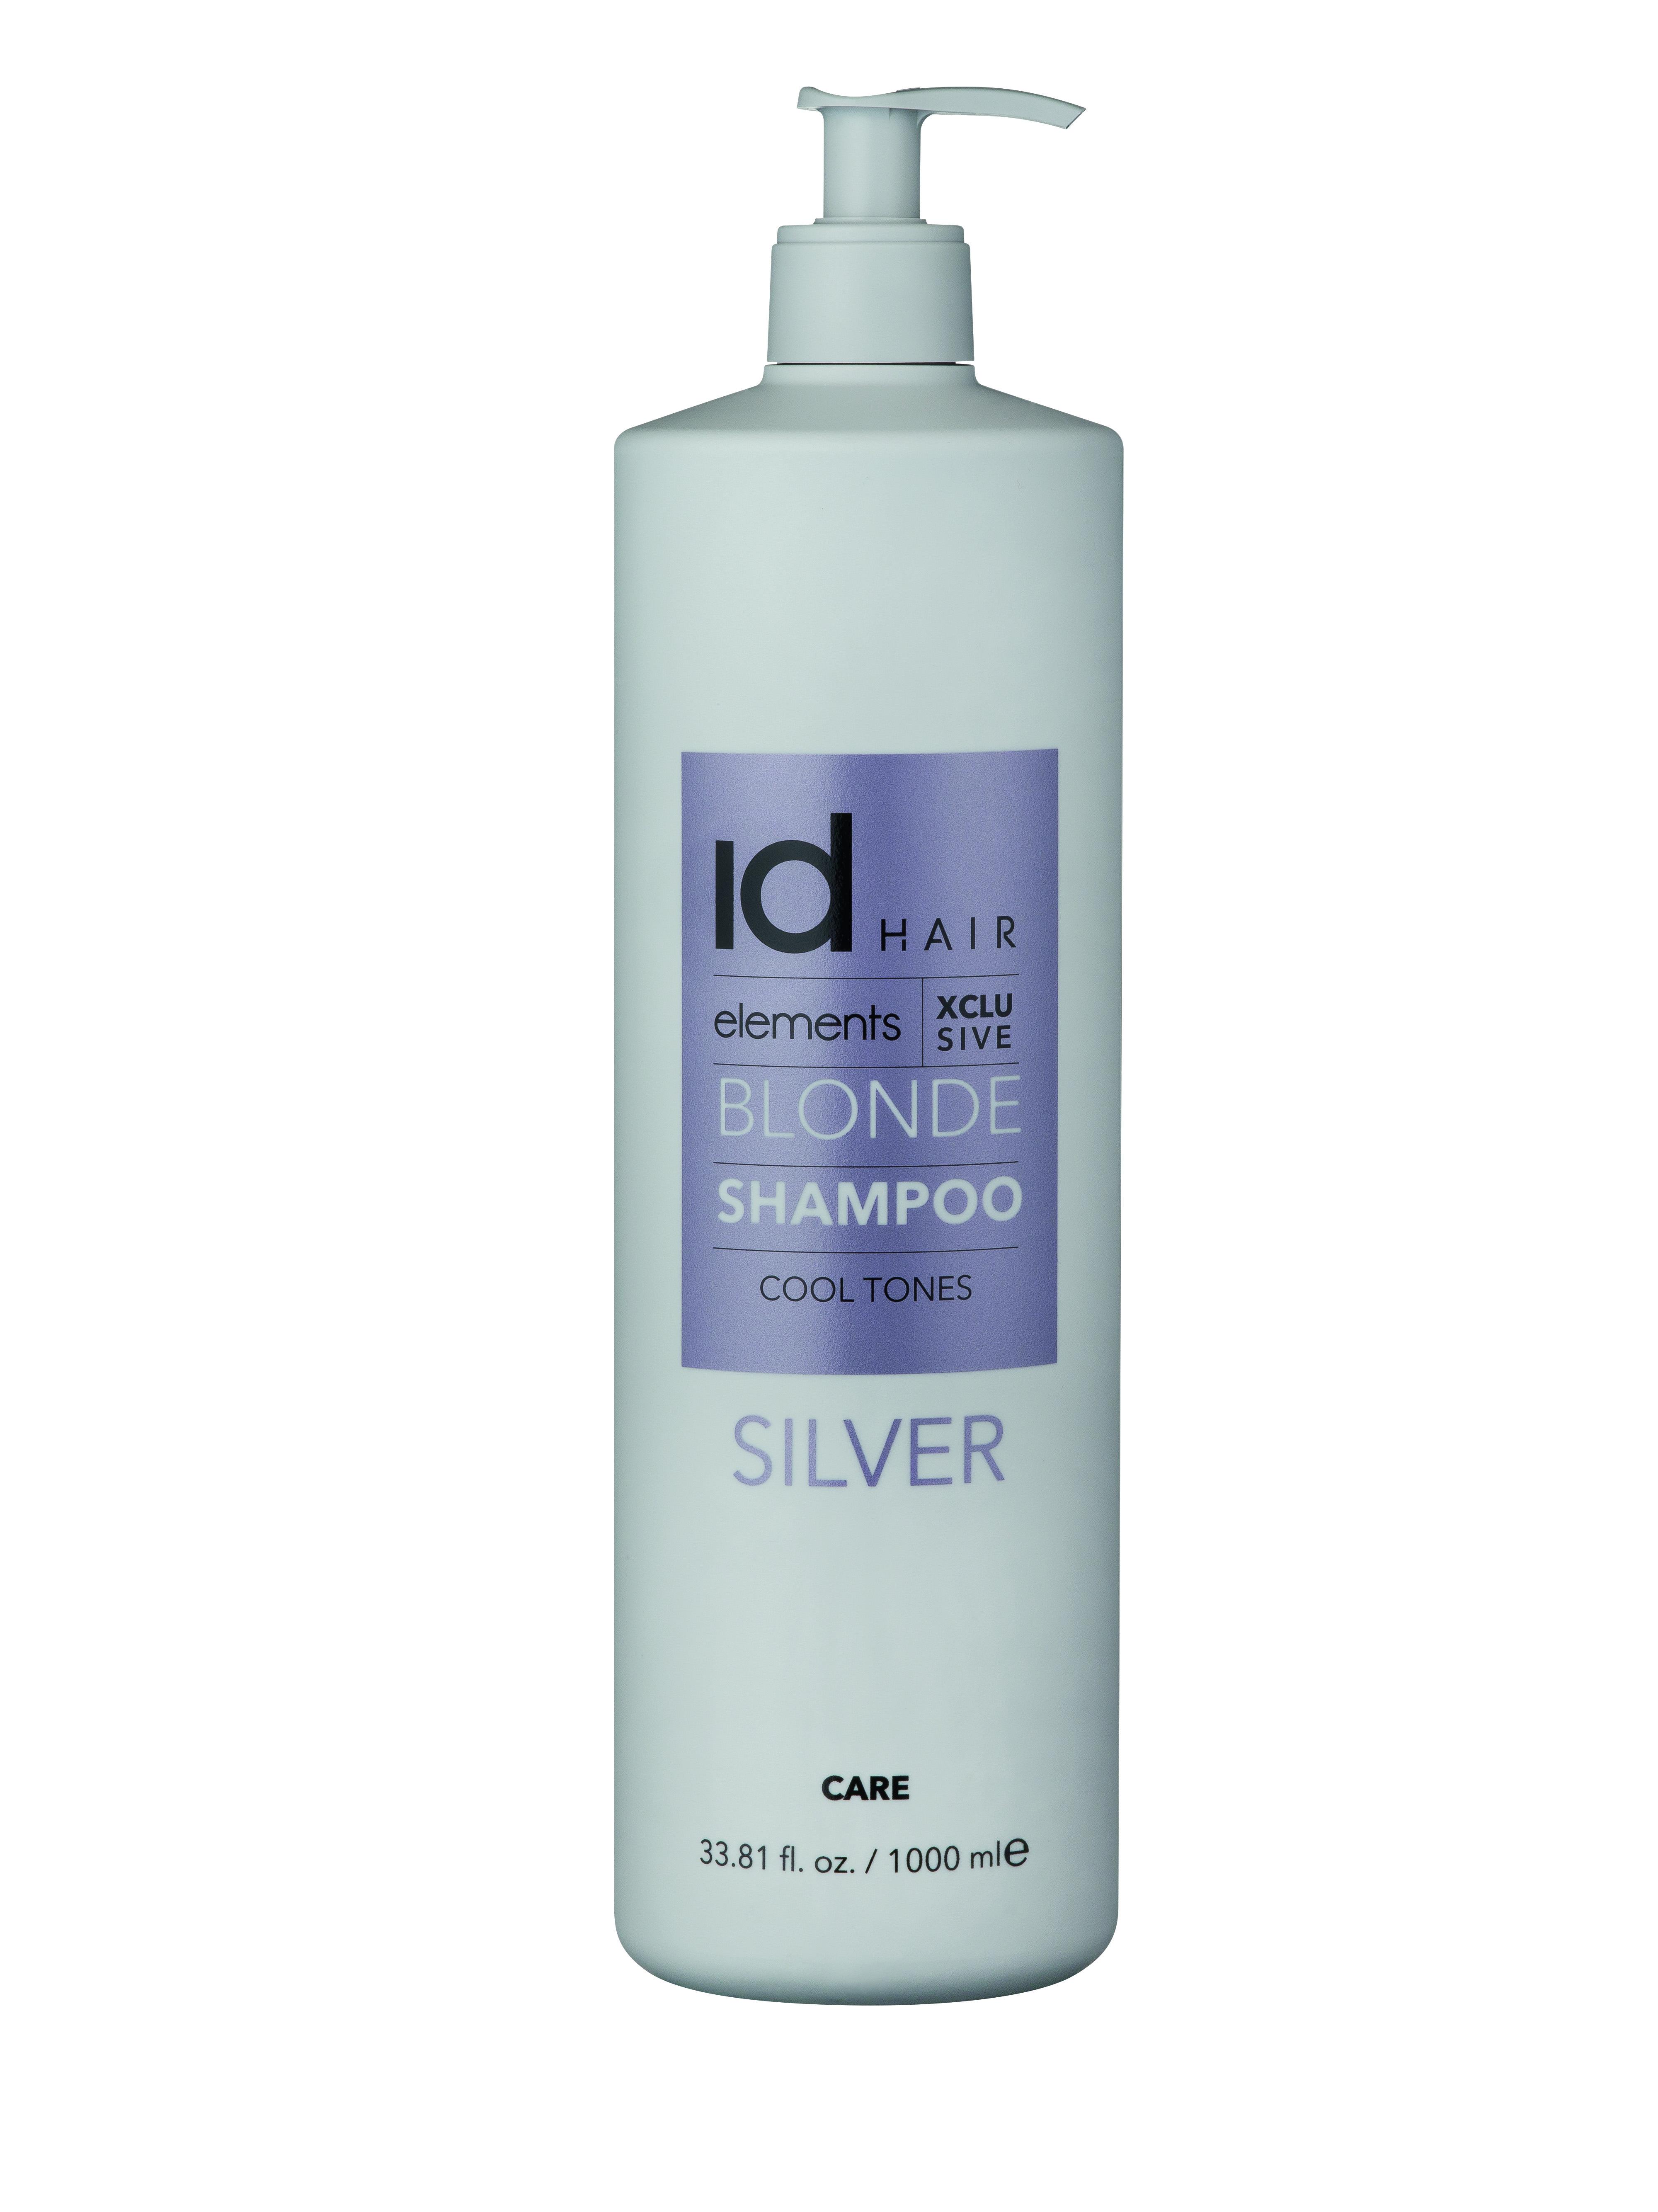 IdHAIR - Elements Xclusive Silver Shampoo 1000 ml